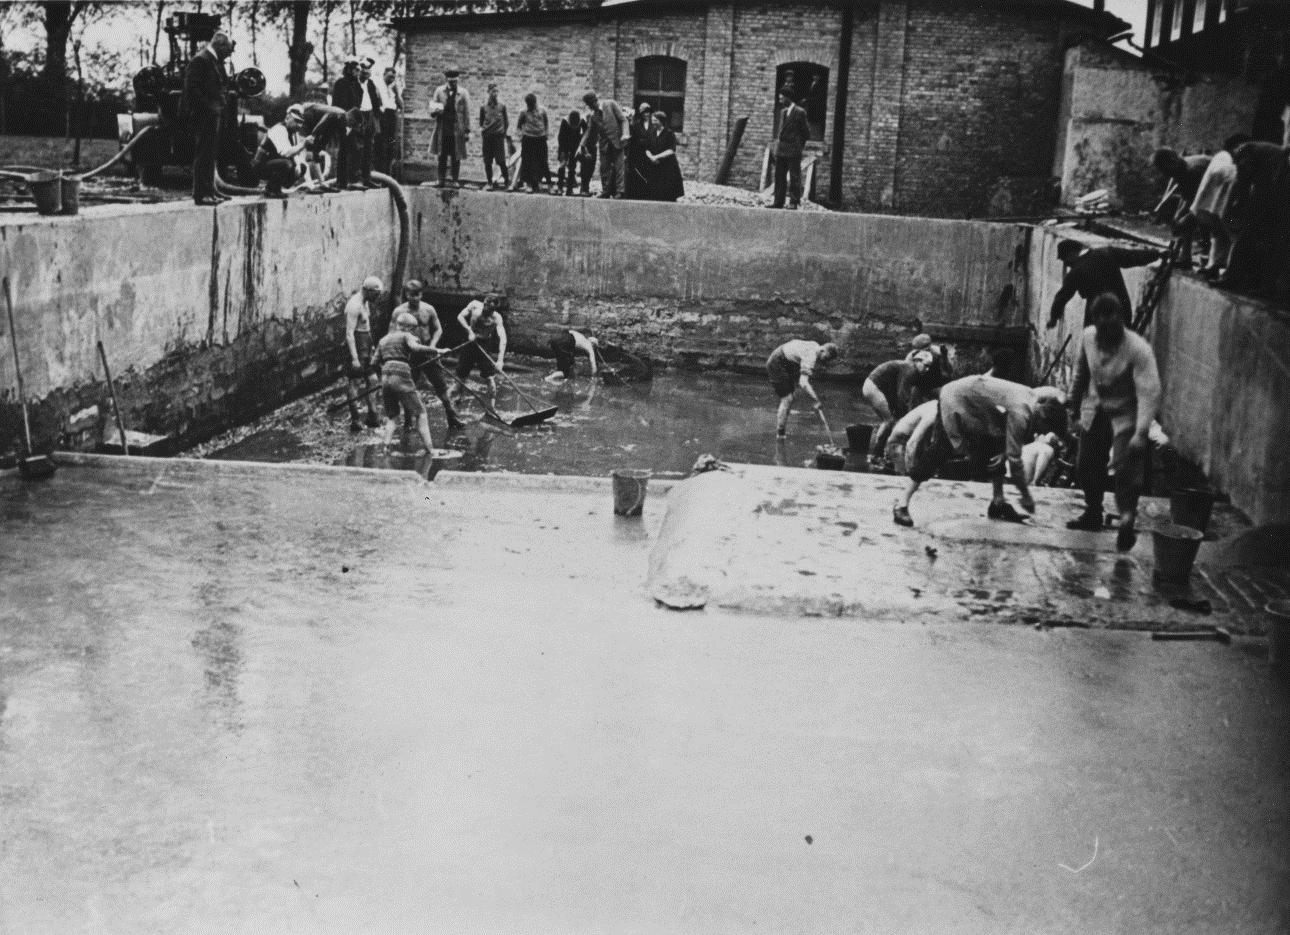 Ausbau Inselbad, Photographie 1933 (StA Paderborn , M 4 Fotosammlung, Klassifikationsgruppe 08.4, Kurwesen und 09.3.3, Schwimmbad Inselbad)